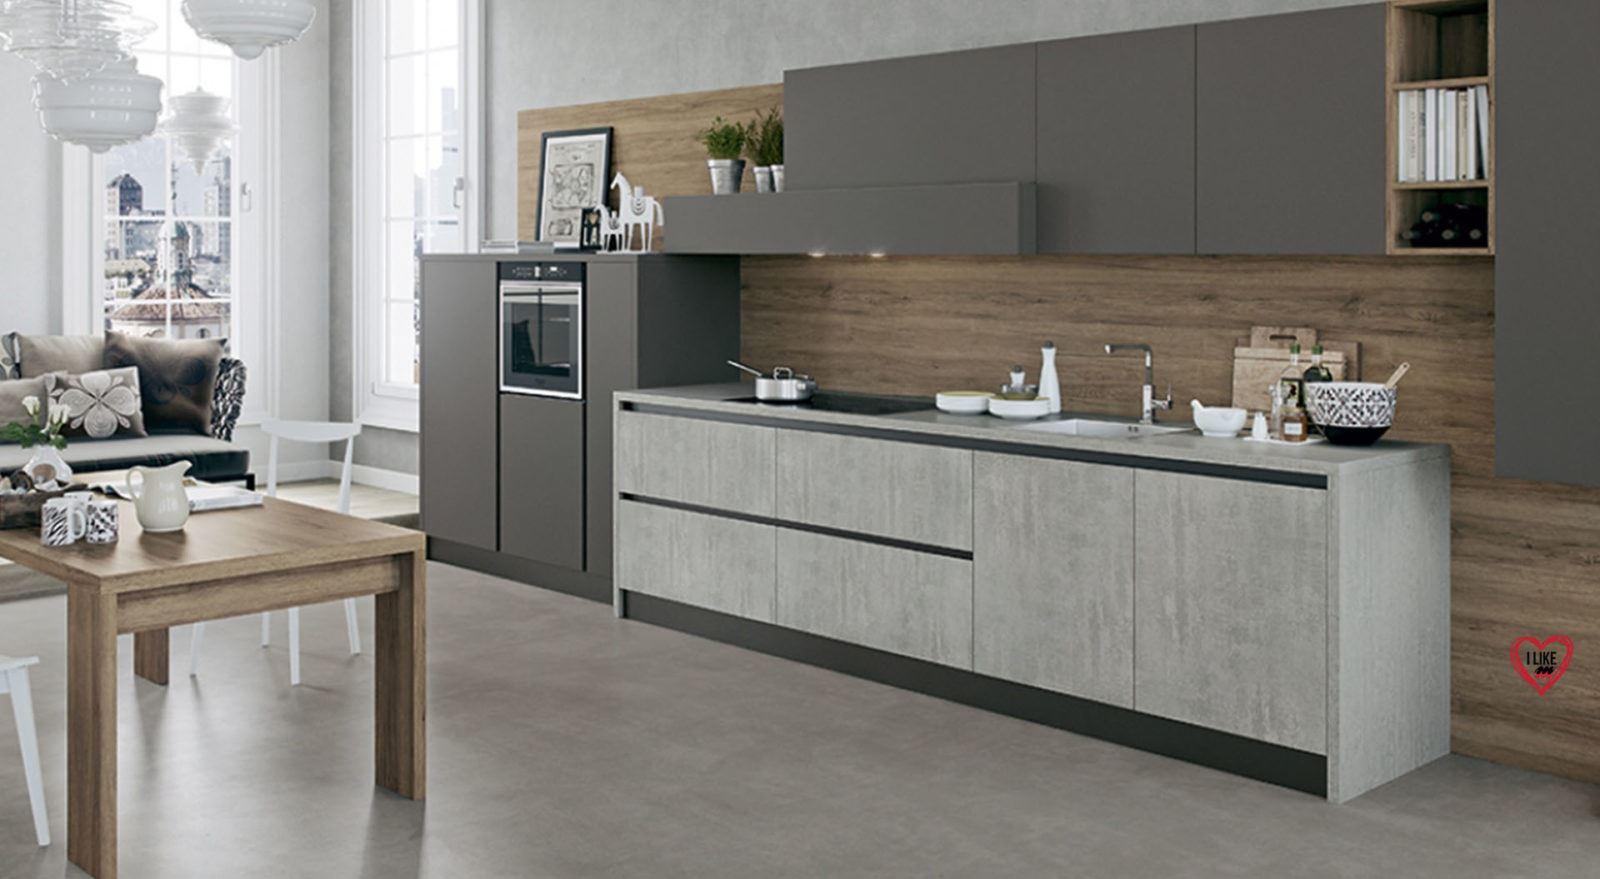 Cucine lineari moderne padova anche in offerta for Cucine moderne